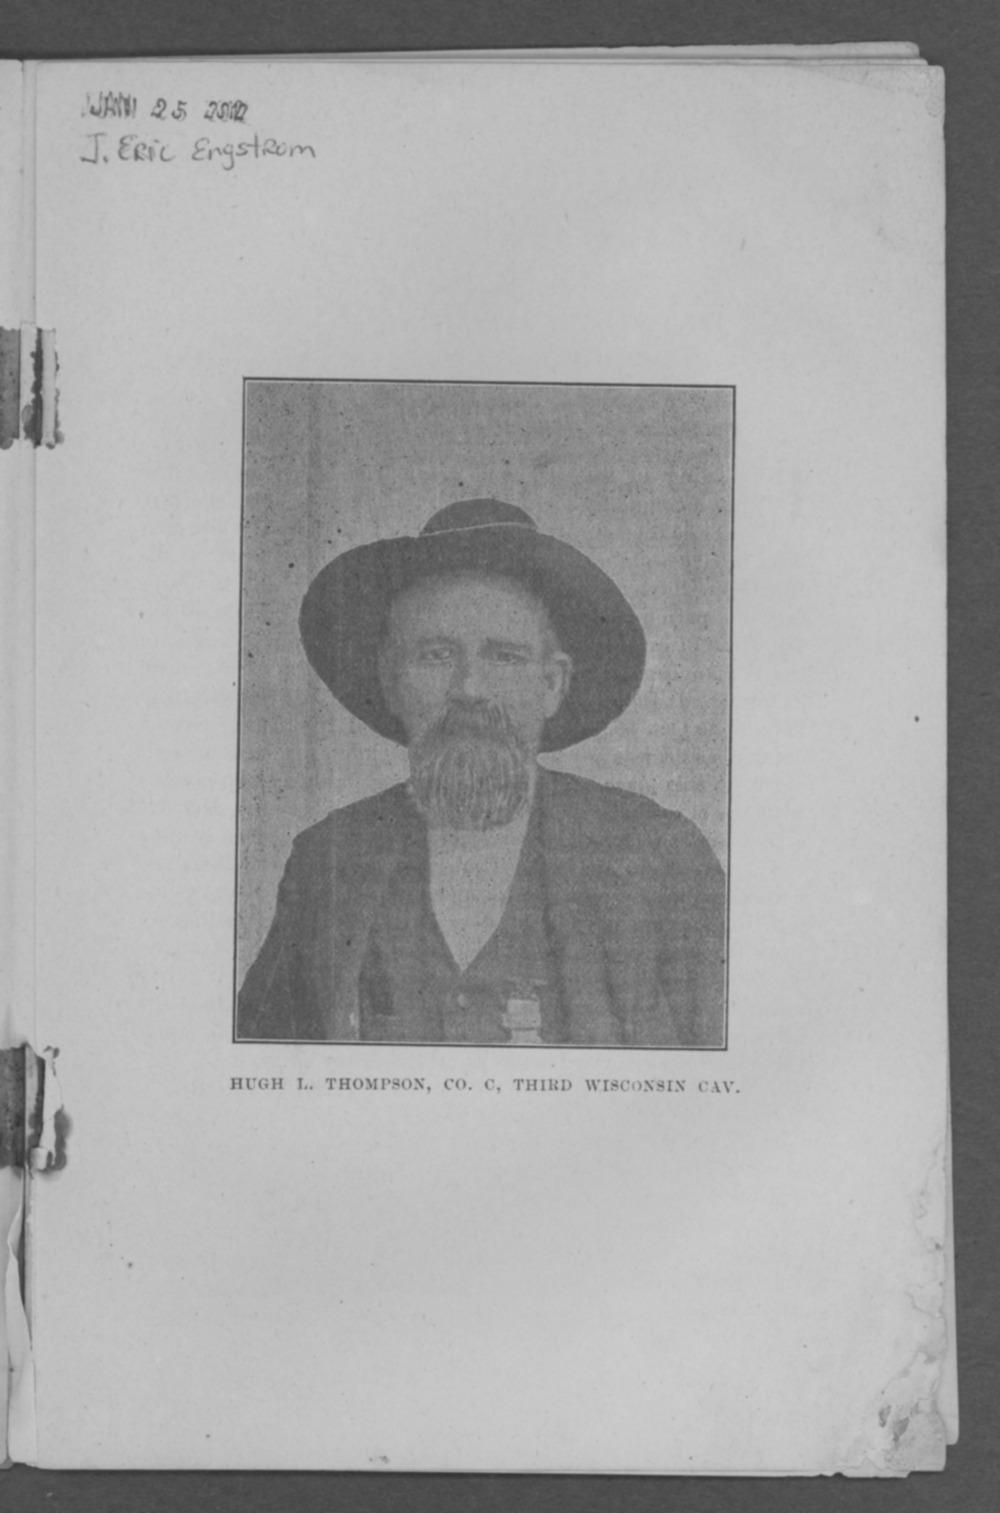 Baxter Springs as a military post - Hugh L. Thompson